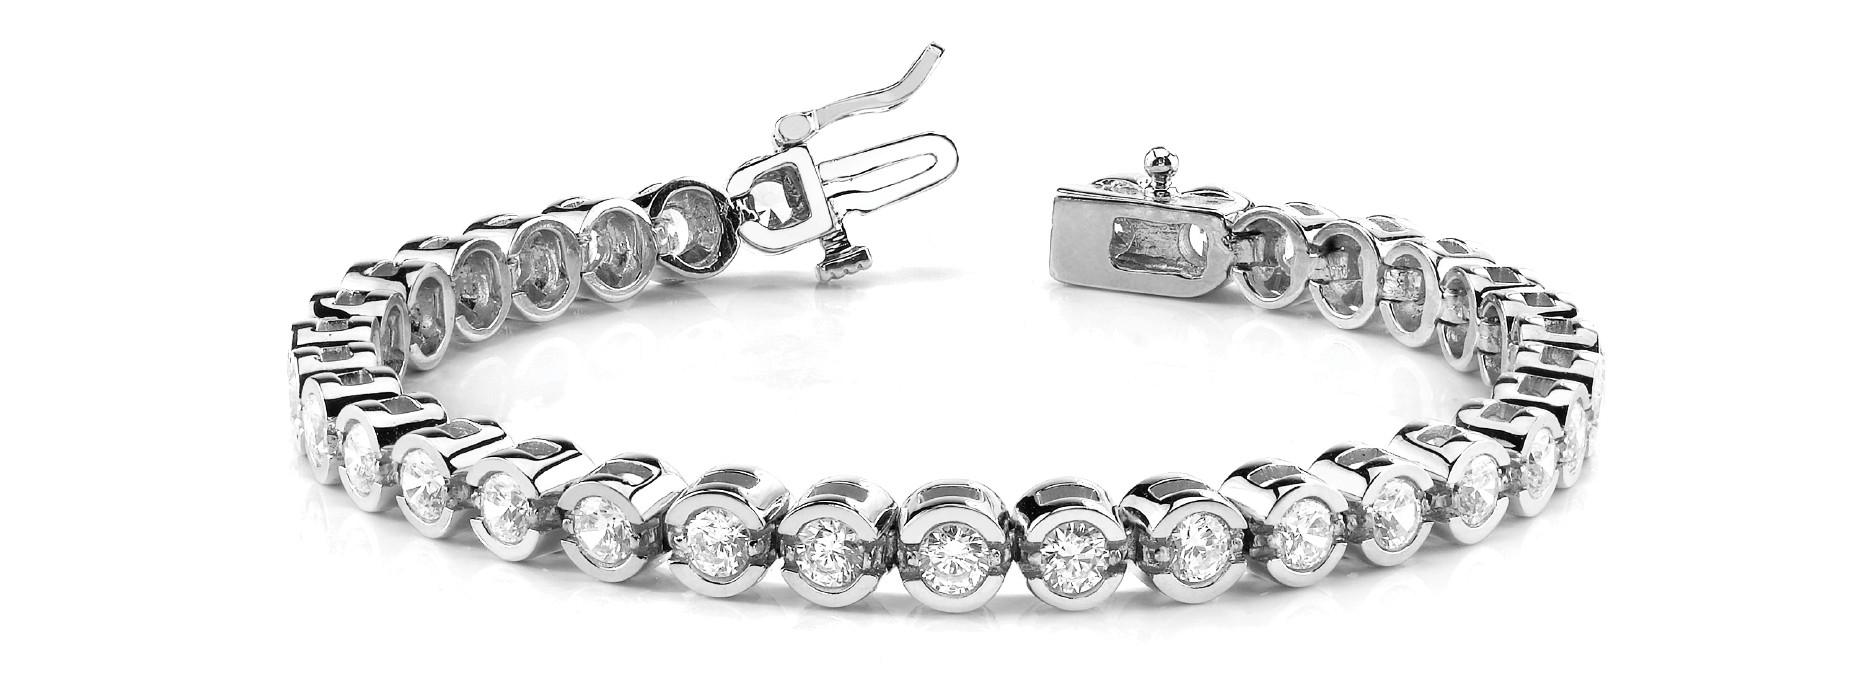 Bracelet In Line Bezel Set